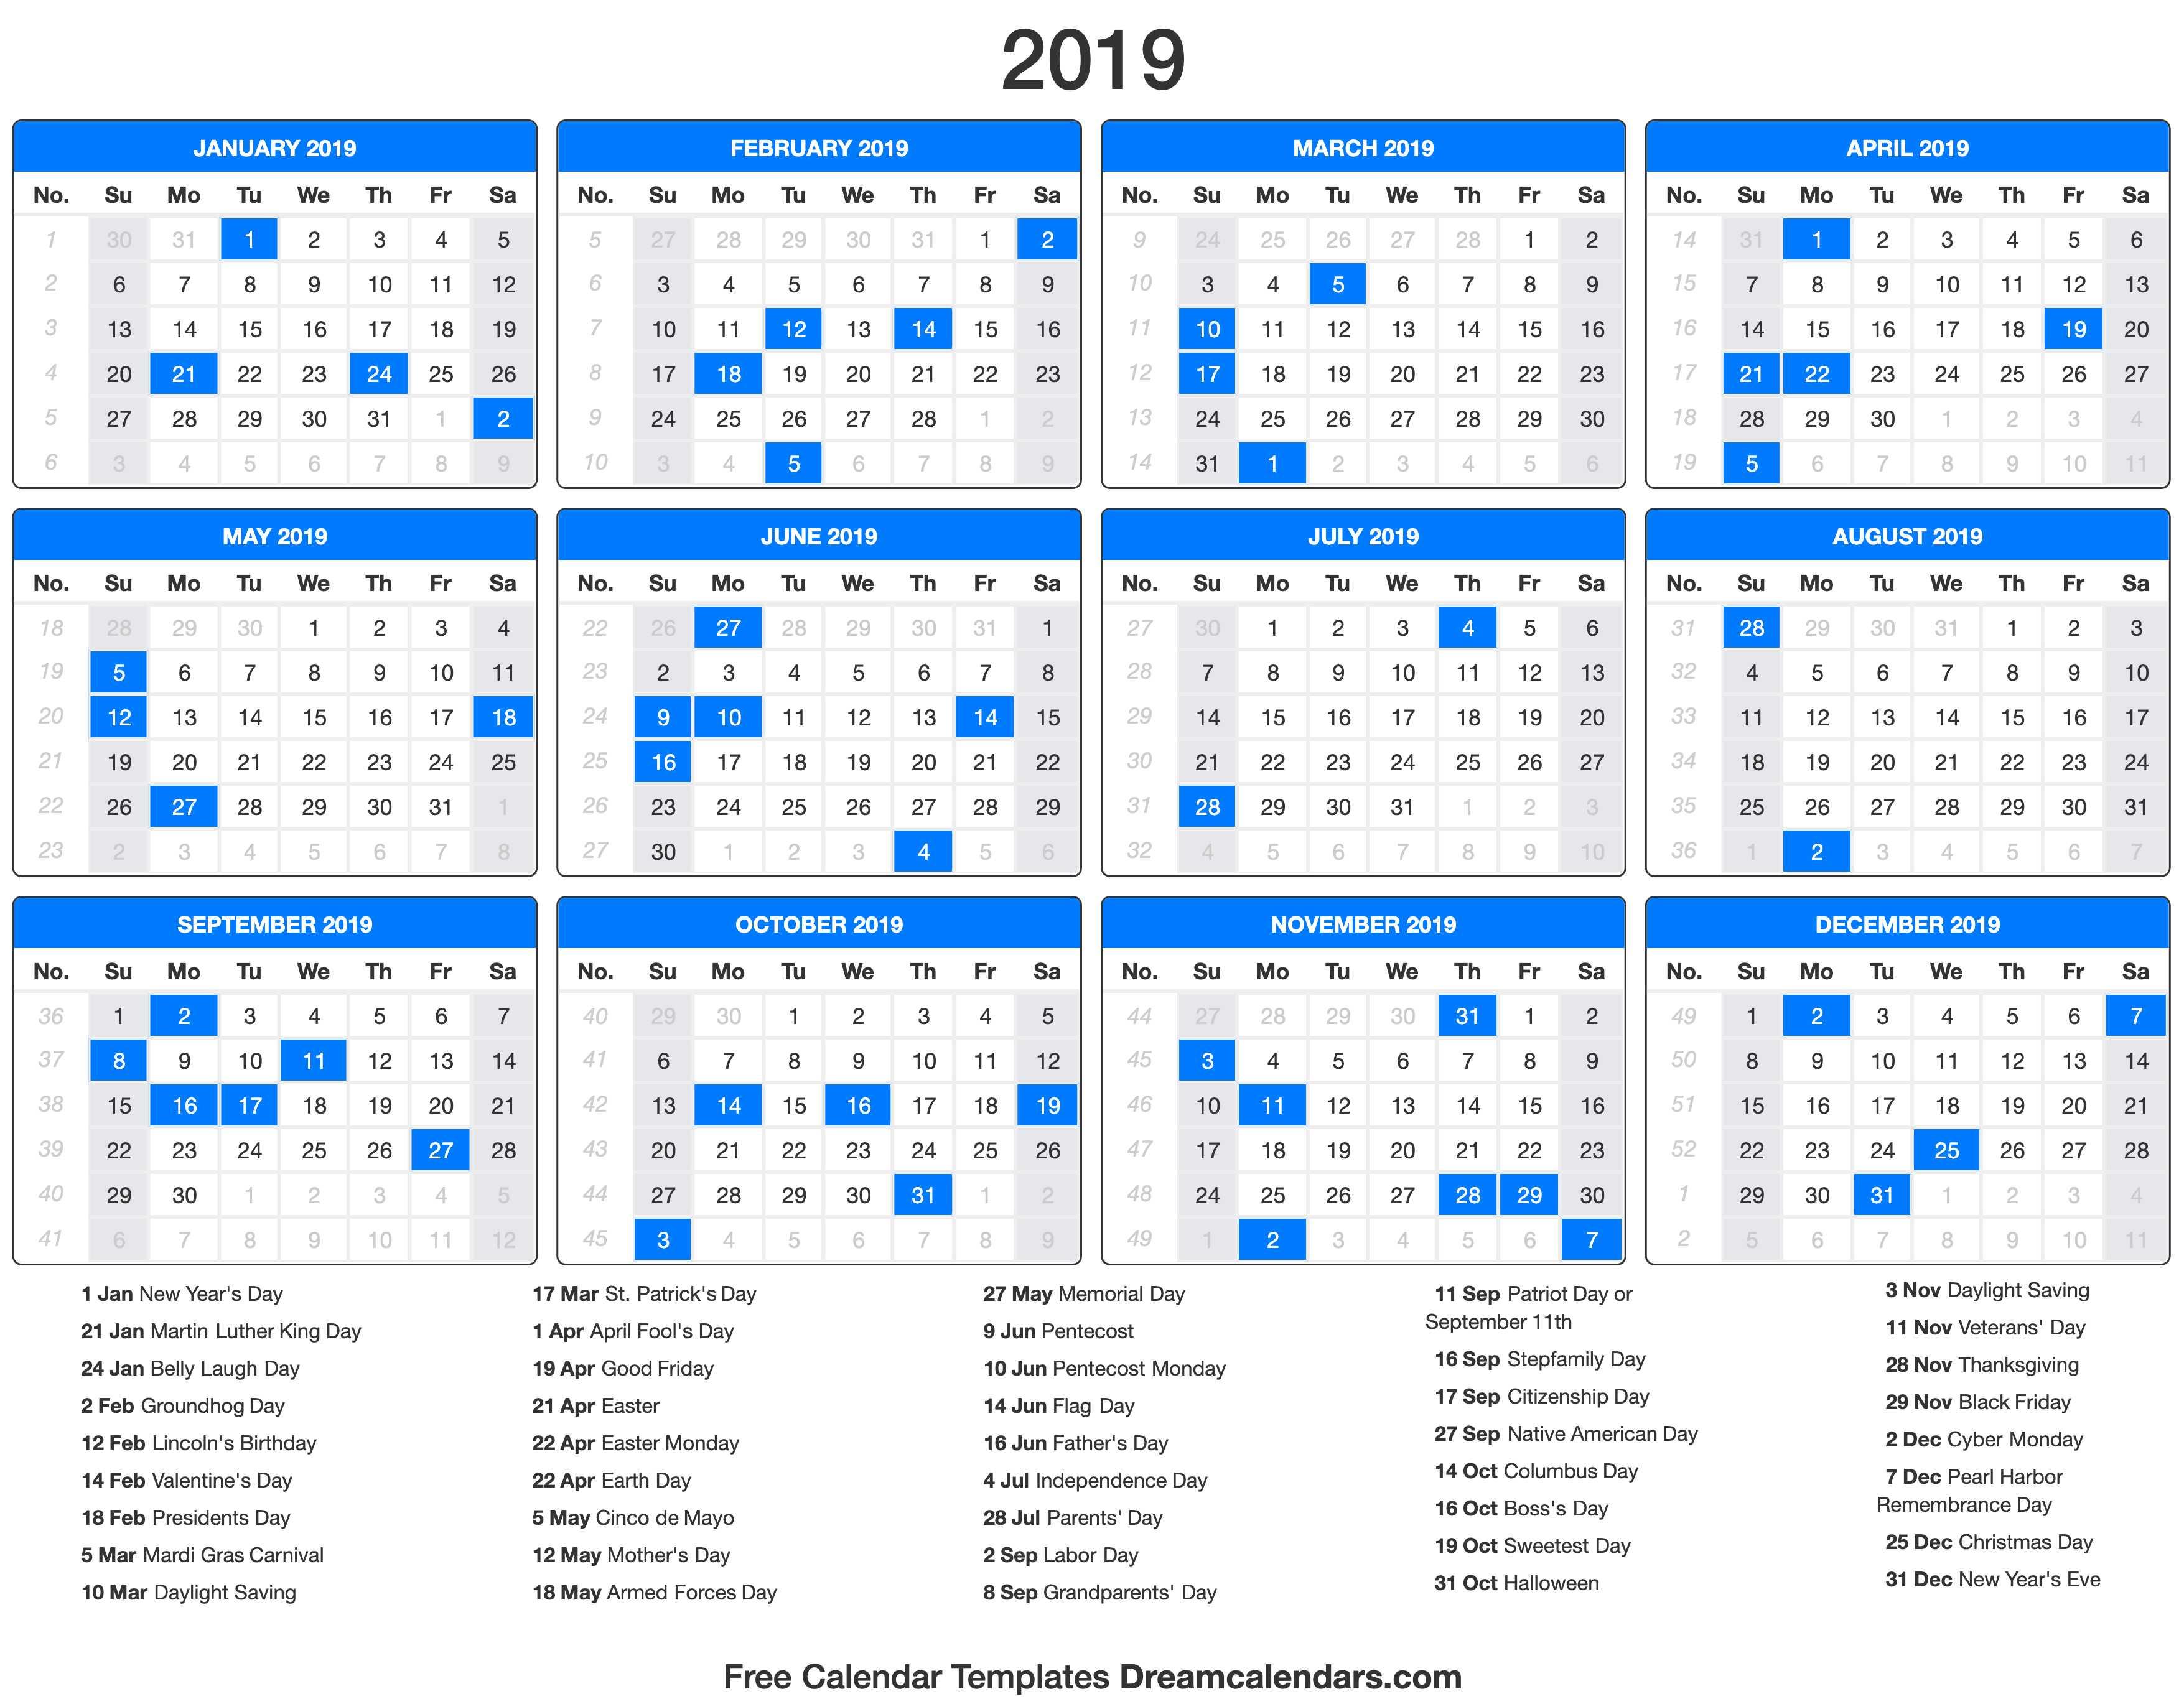 Calendar 2019 Hindi Lala Ramswaroop Pdf Free Download  Nail in Lala Ramswaroop Calendar 2020